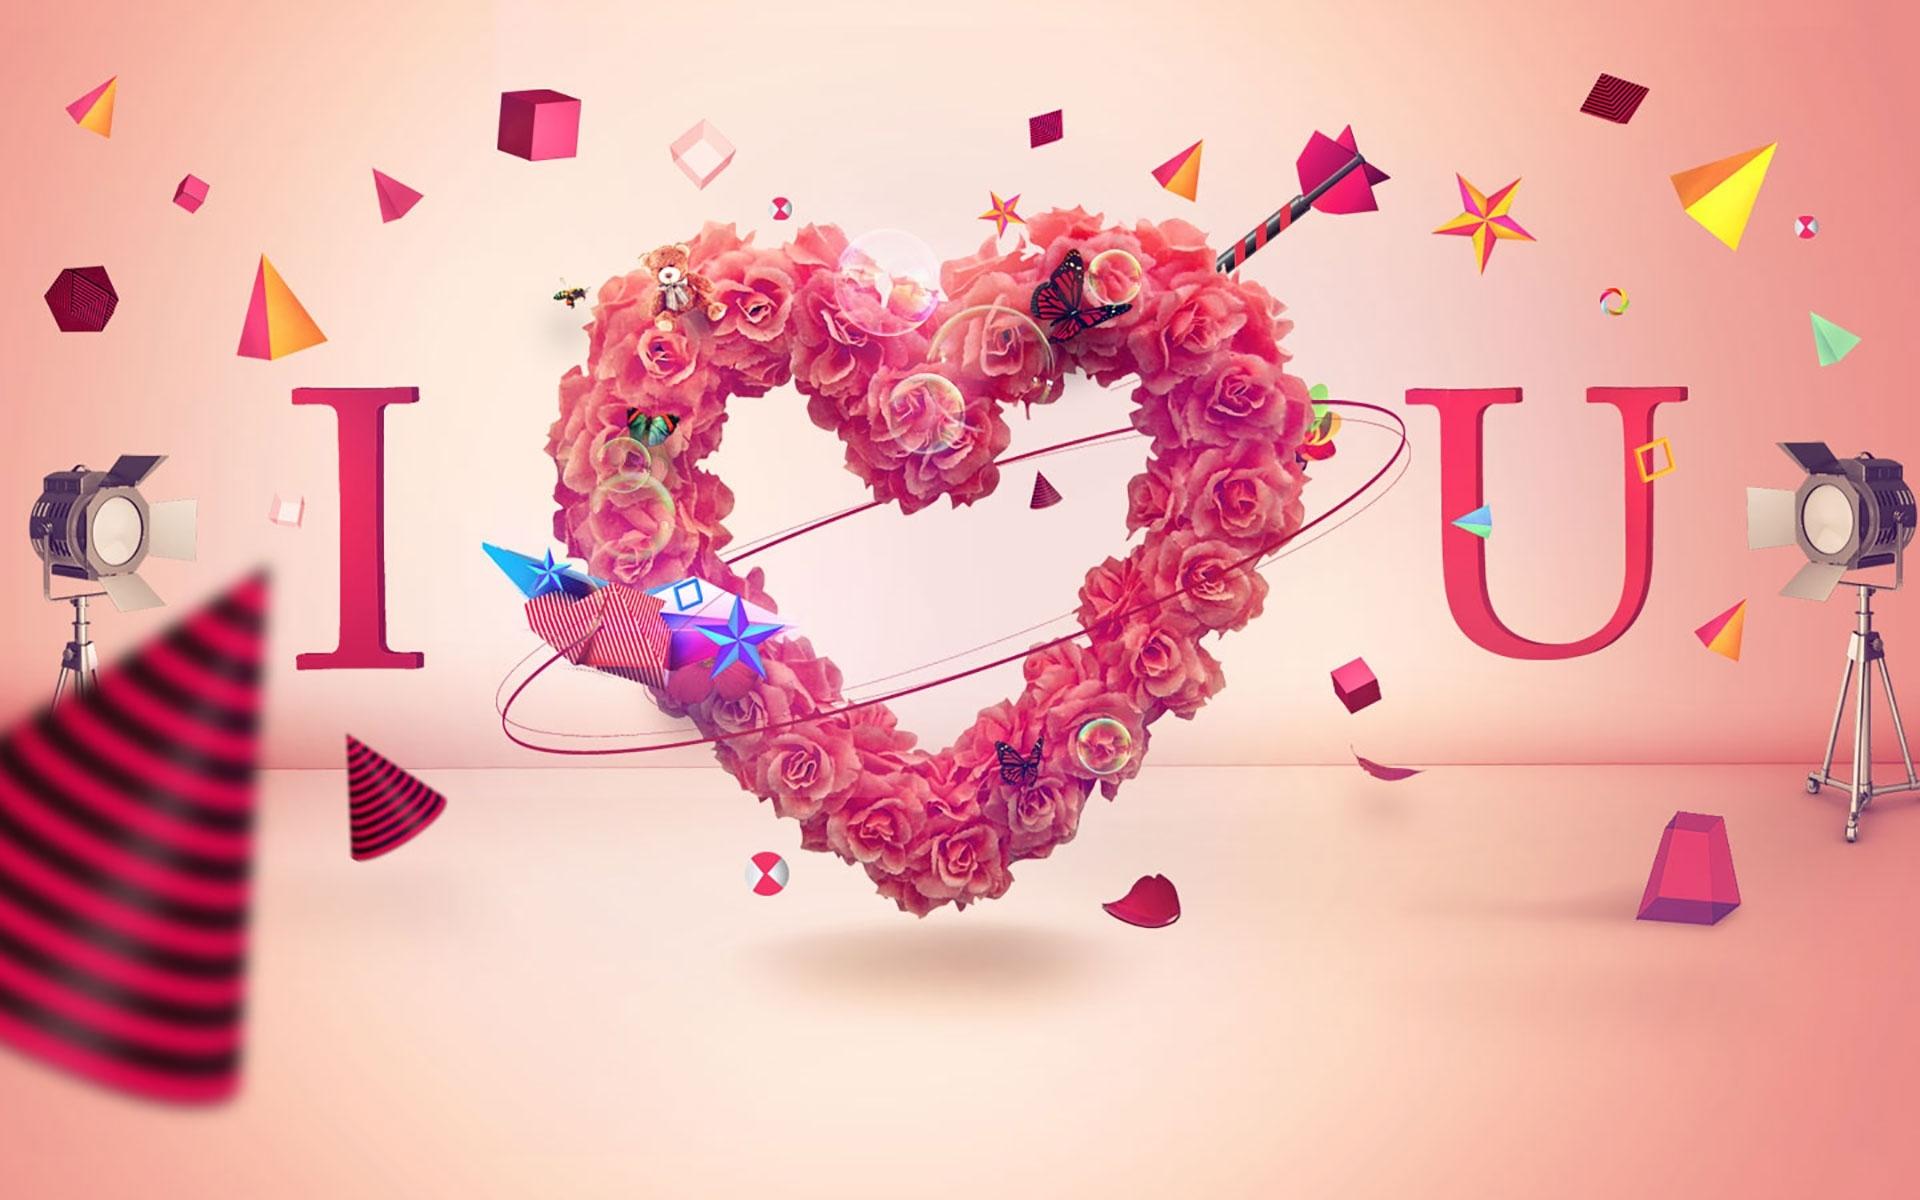 best i love u wallpaper free download hd widescreen you cute images